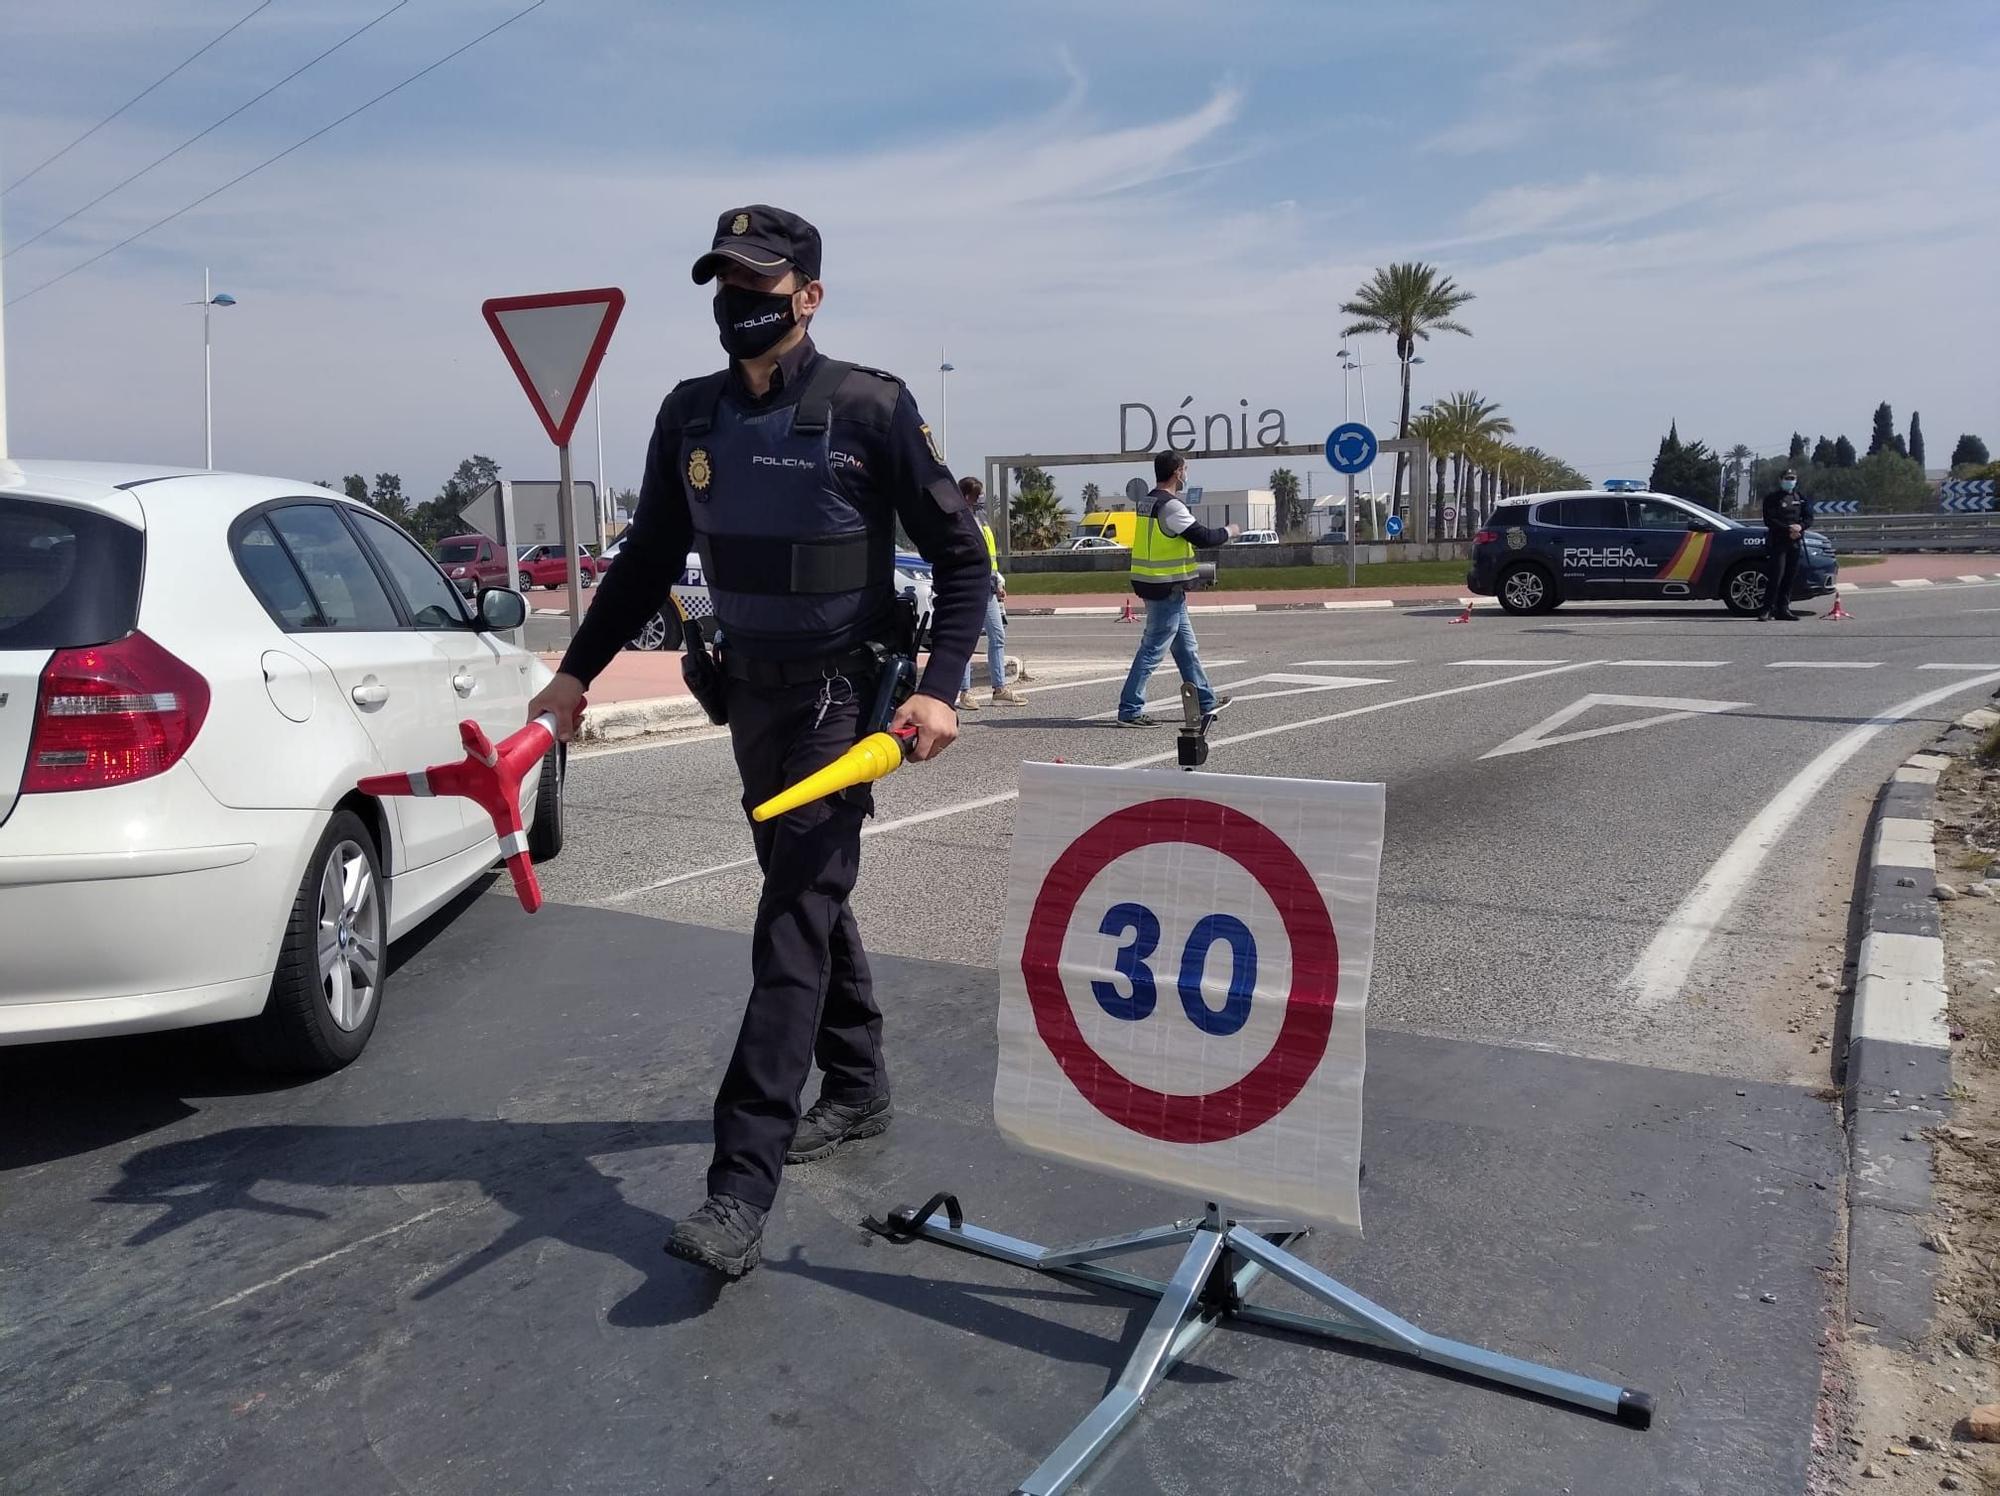 Controles de acceso en Dénia para evitar la llegada de turista de fuera de la Comunitat Valenciana